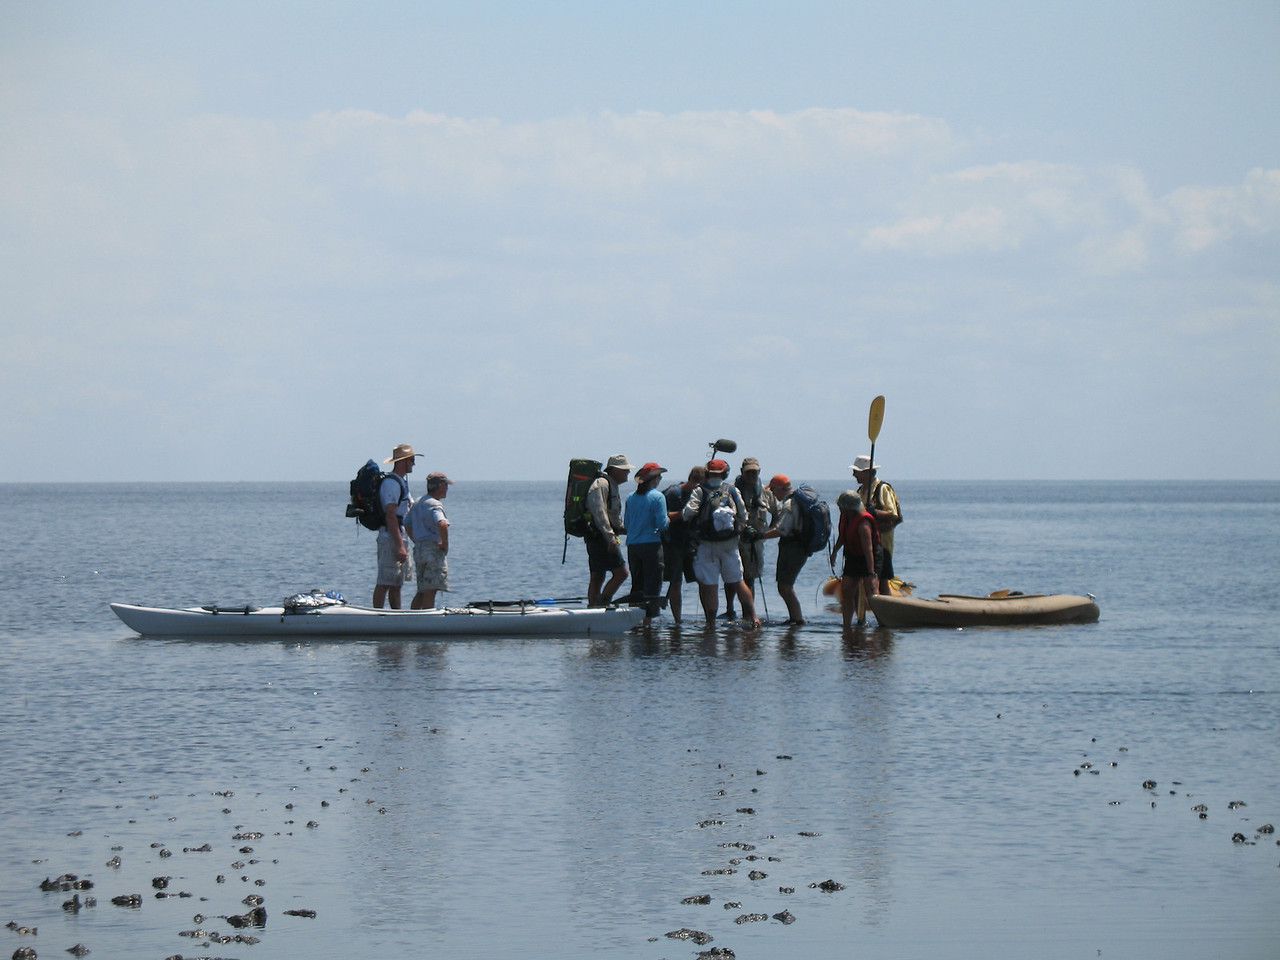 Closing shots: hikers and kayakers meet in Lake Okeechobee